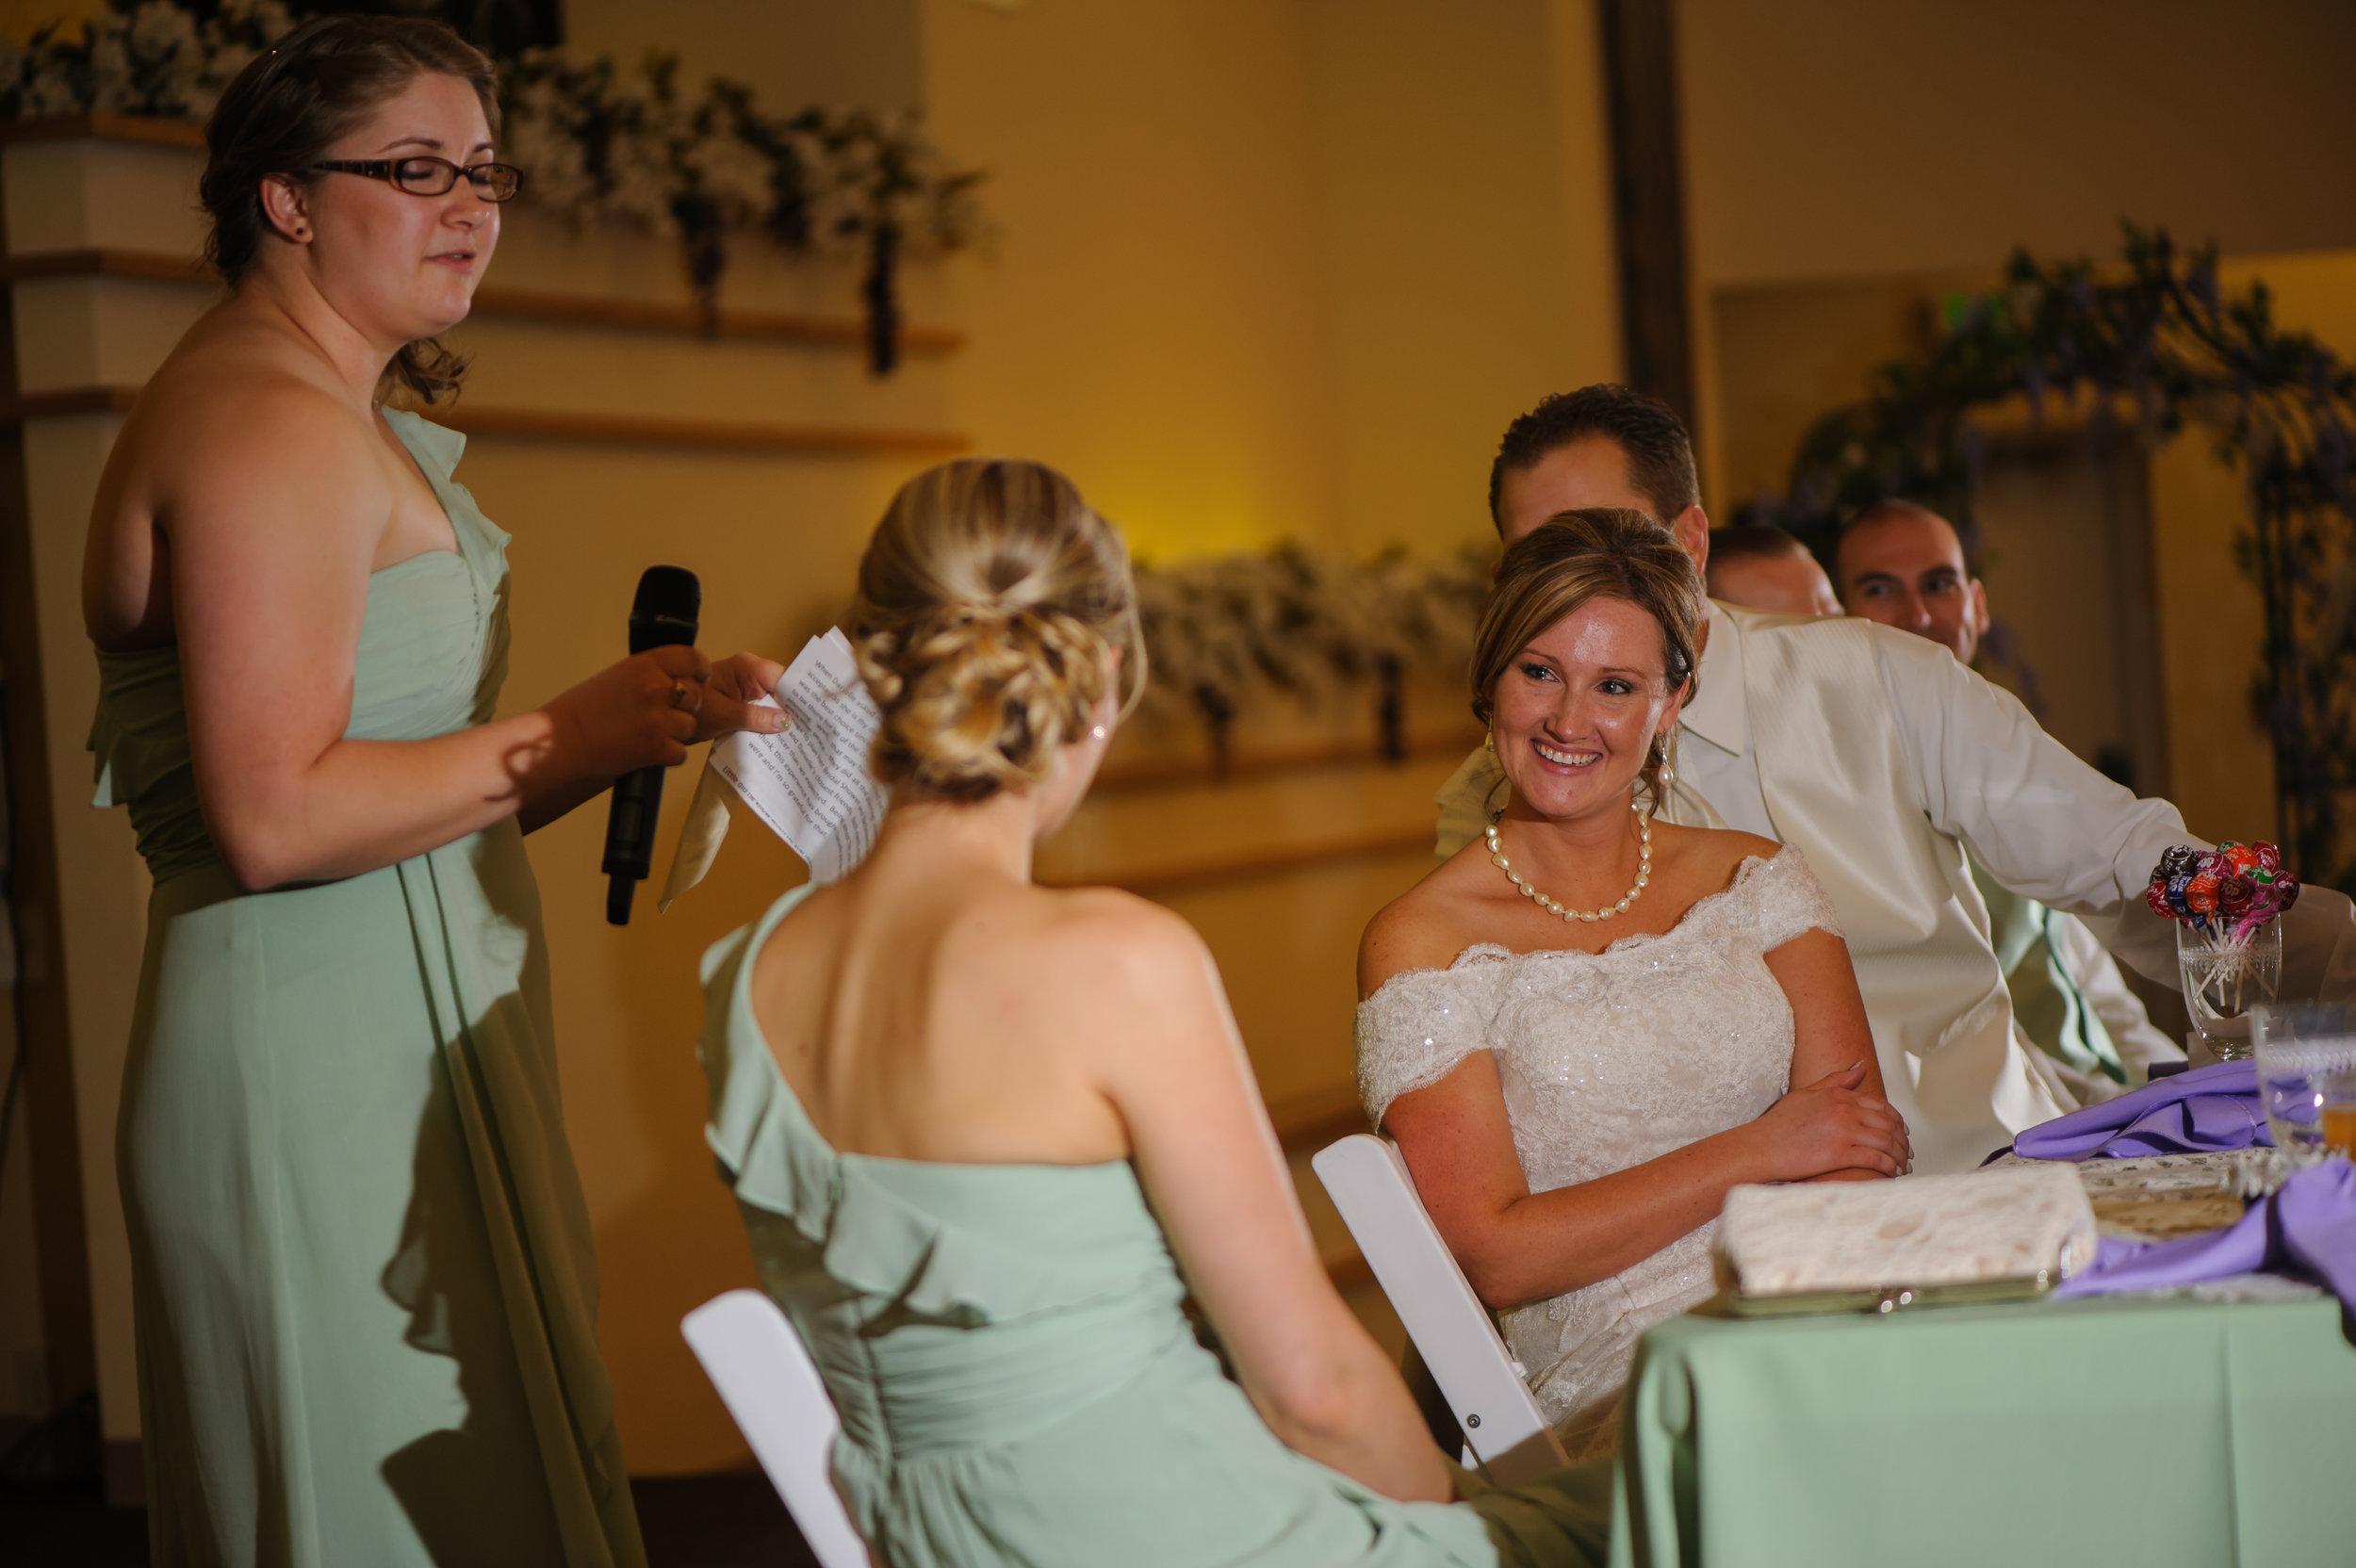 danielle-ross-026-sacramento-wedding-photographer-katherine-nicole-photography.JPG